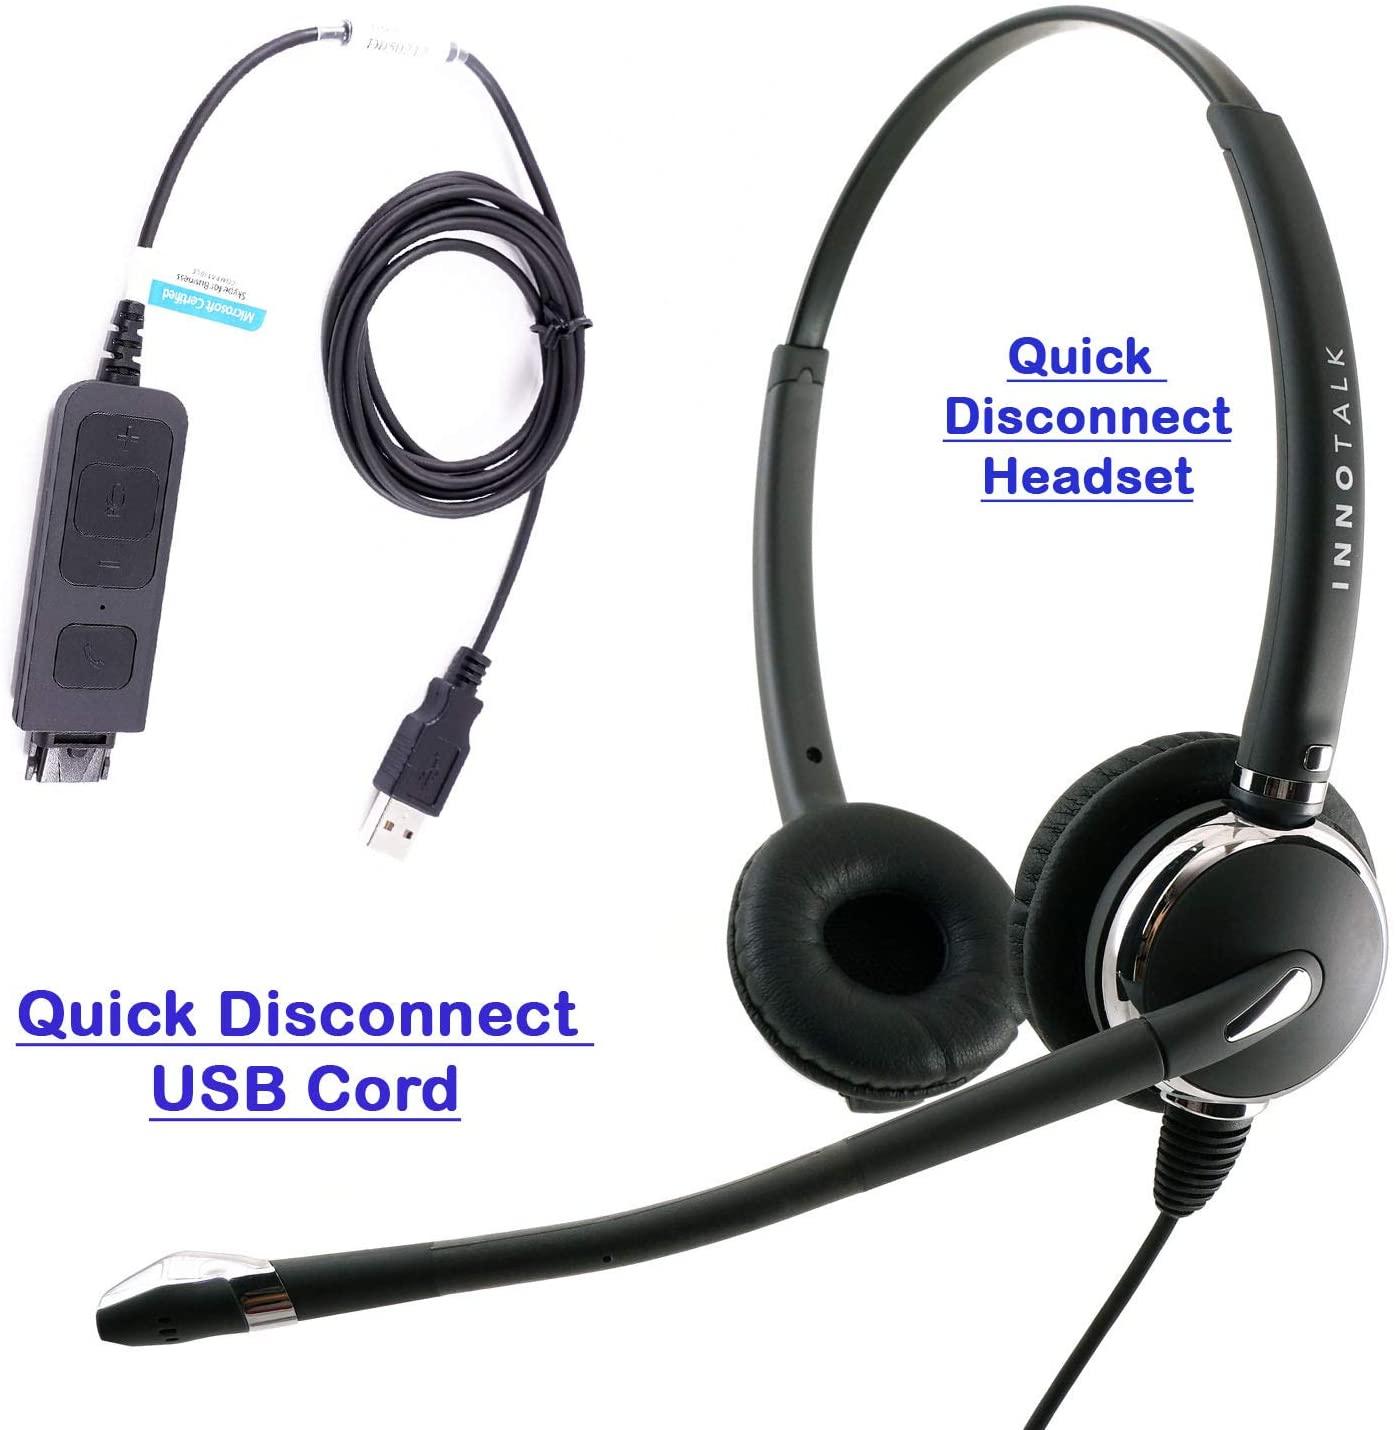 Noise Cancel Mic USB Headset for MS Lync, Skype, Cisco Jabber, Avaya One-X Agent. Built in Plug N Play USB Technology Compatible with Plantronics QD